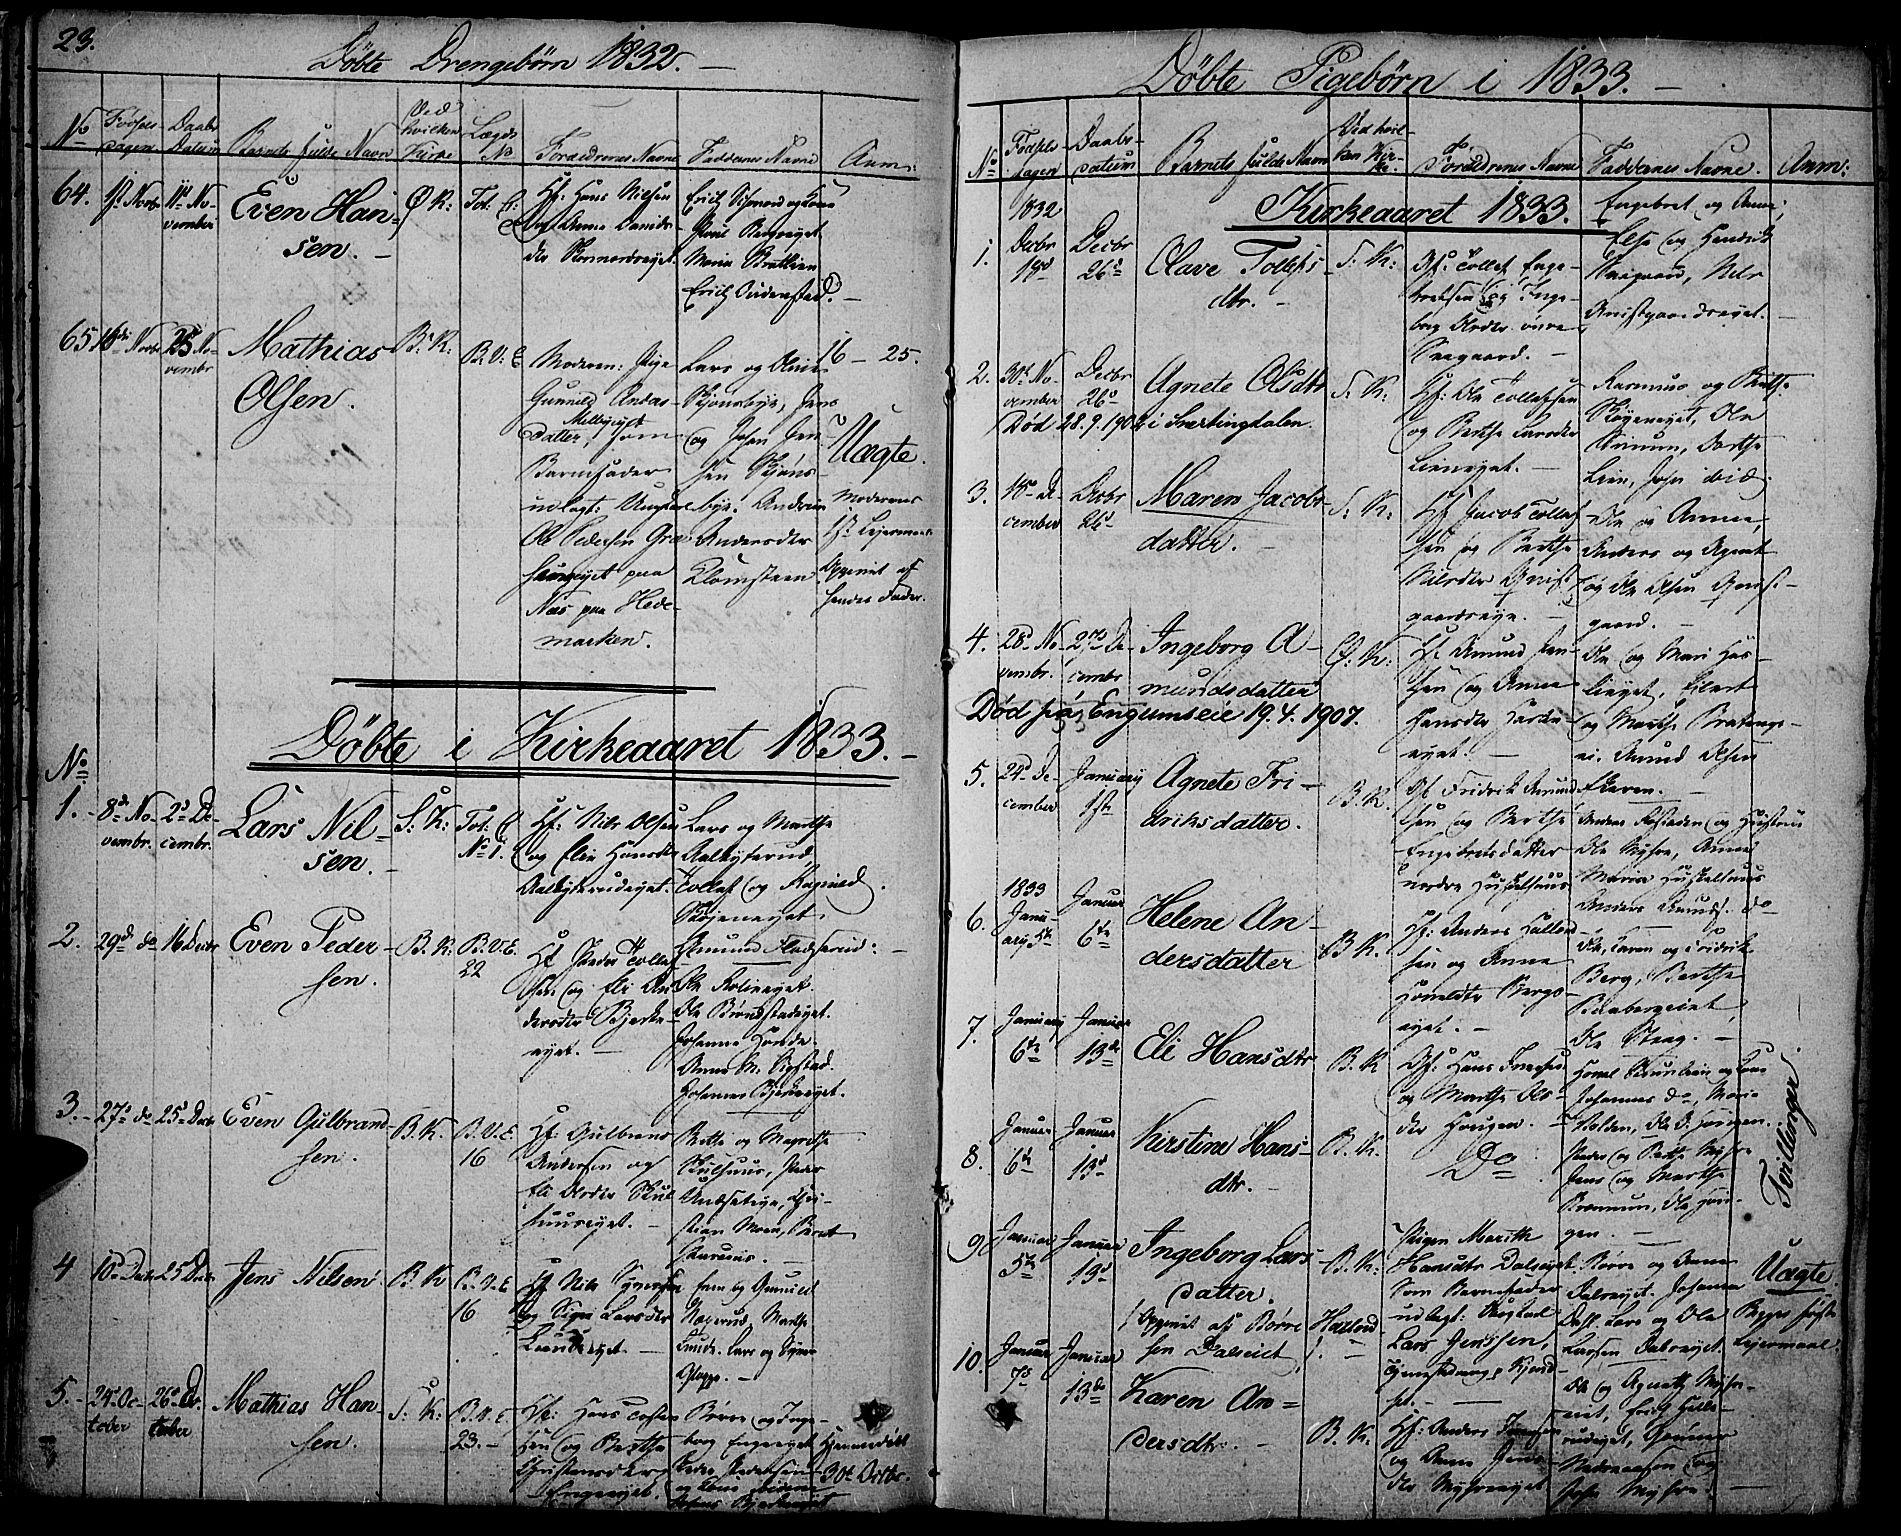 SAH, Biri prestekontor, Ministerialbok nr. 4, 1829-1842, s. 23